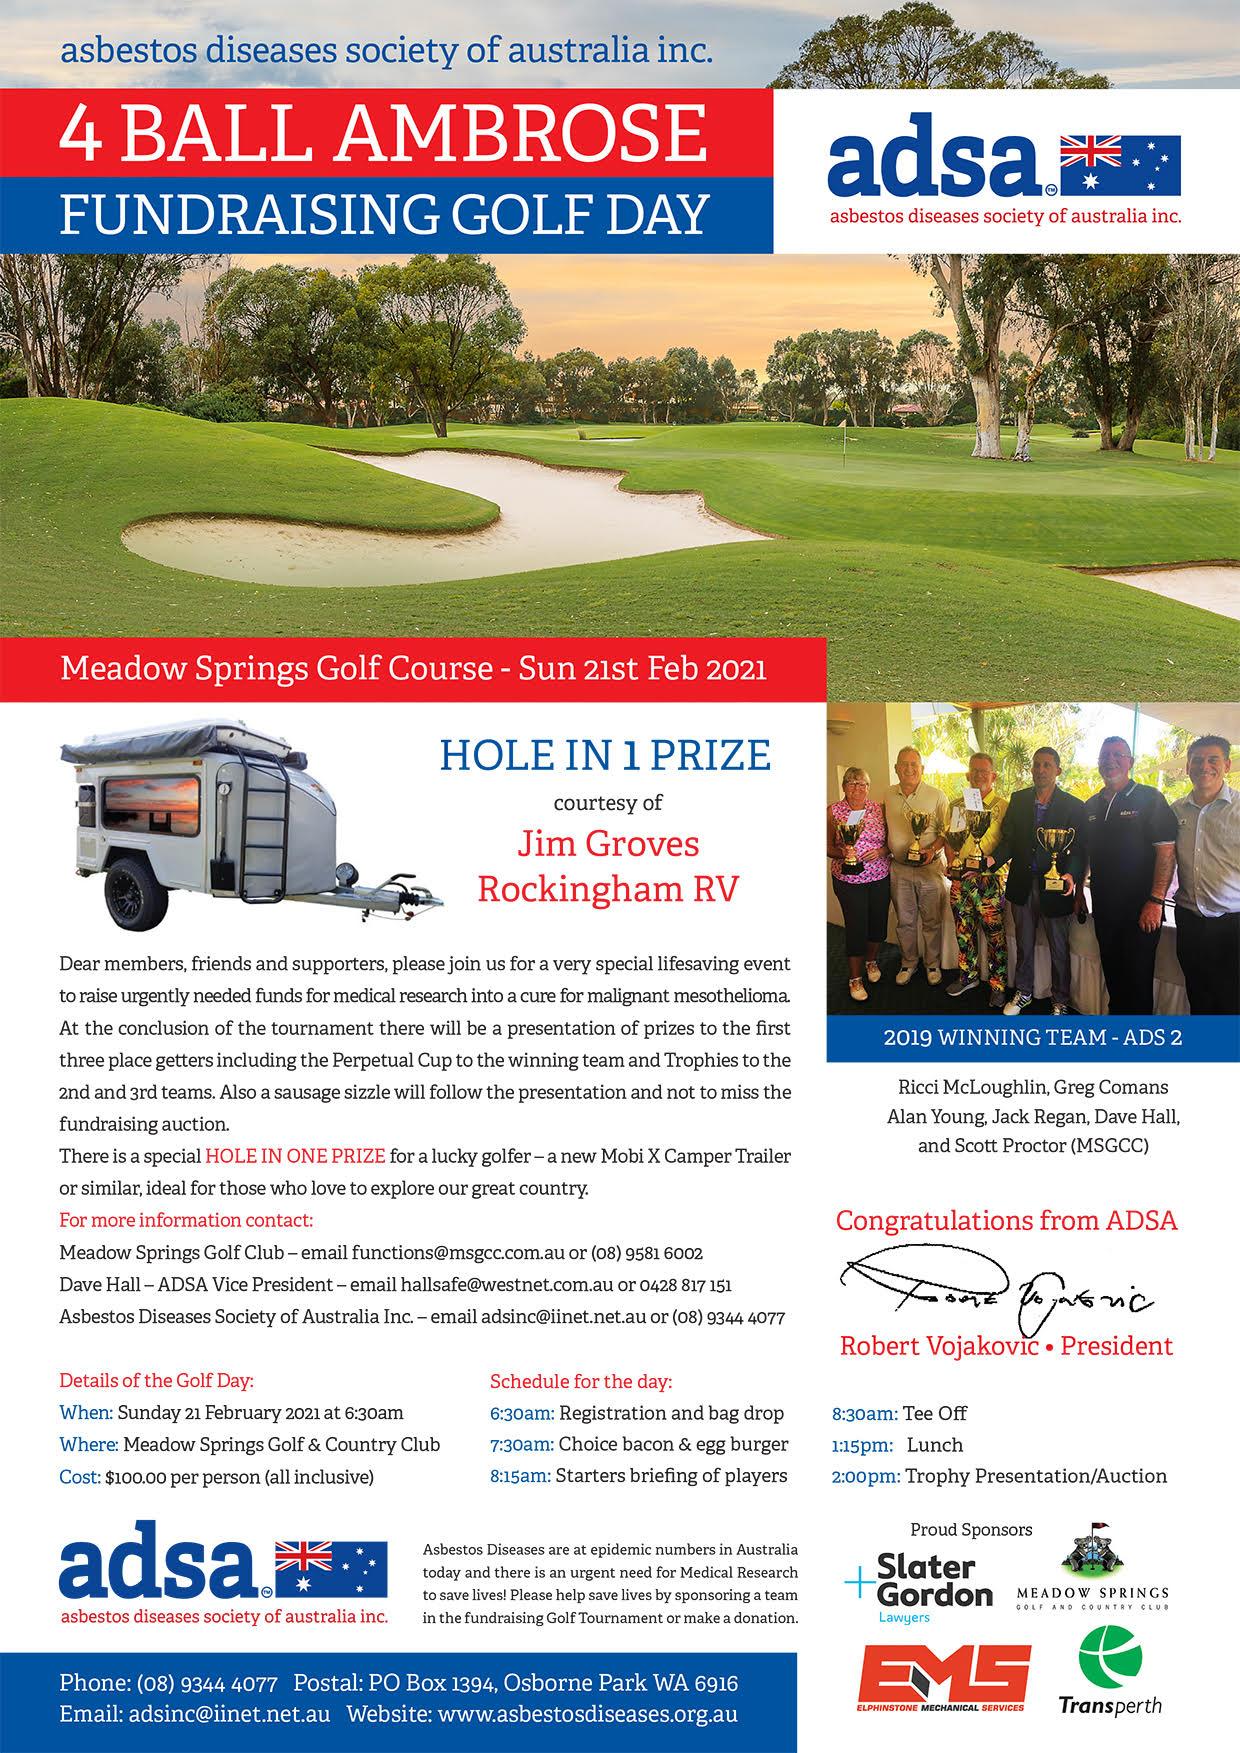 4 Ball Ambrose Fundraising Golf Day - Asbestos Diseases